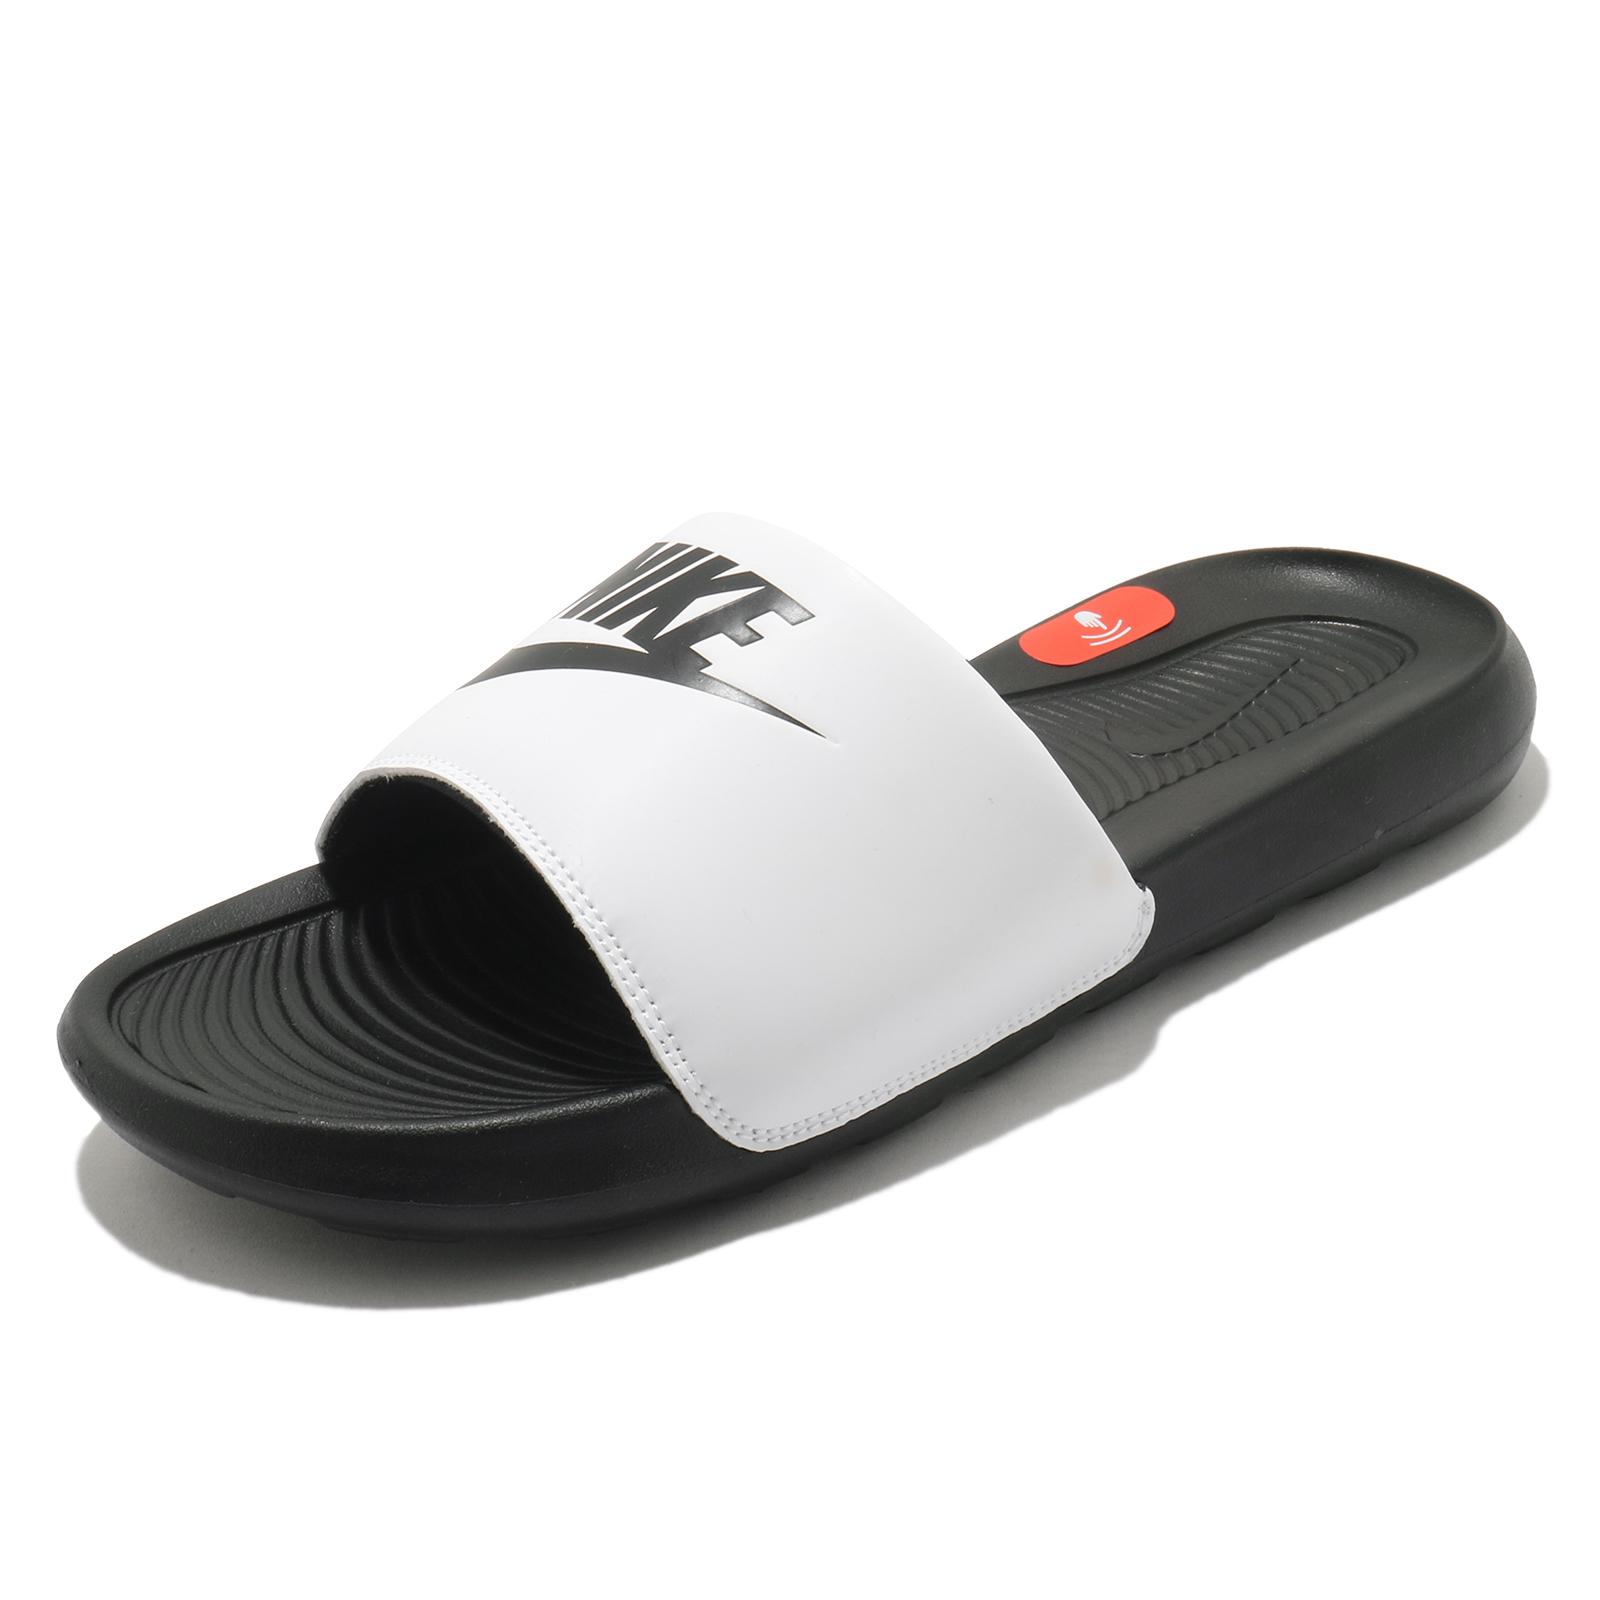 Nike 拖鞋 Victori One Slide Mix 黑白 鴛鴦配色 男鞋 涼拖鞋【ACS】 DD0234-100